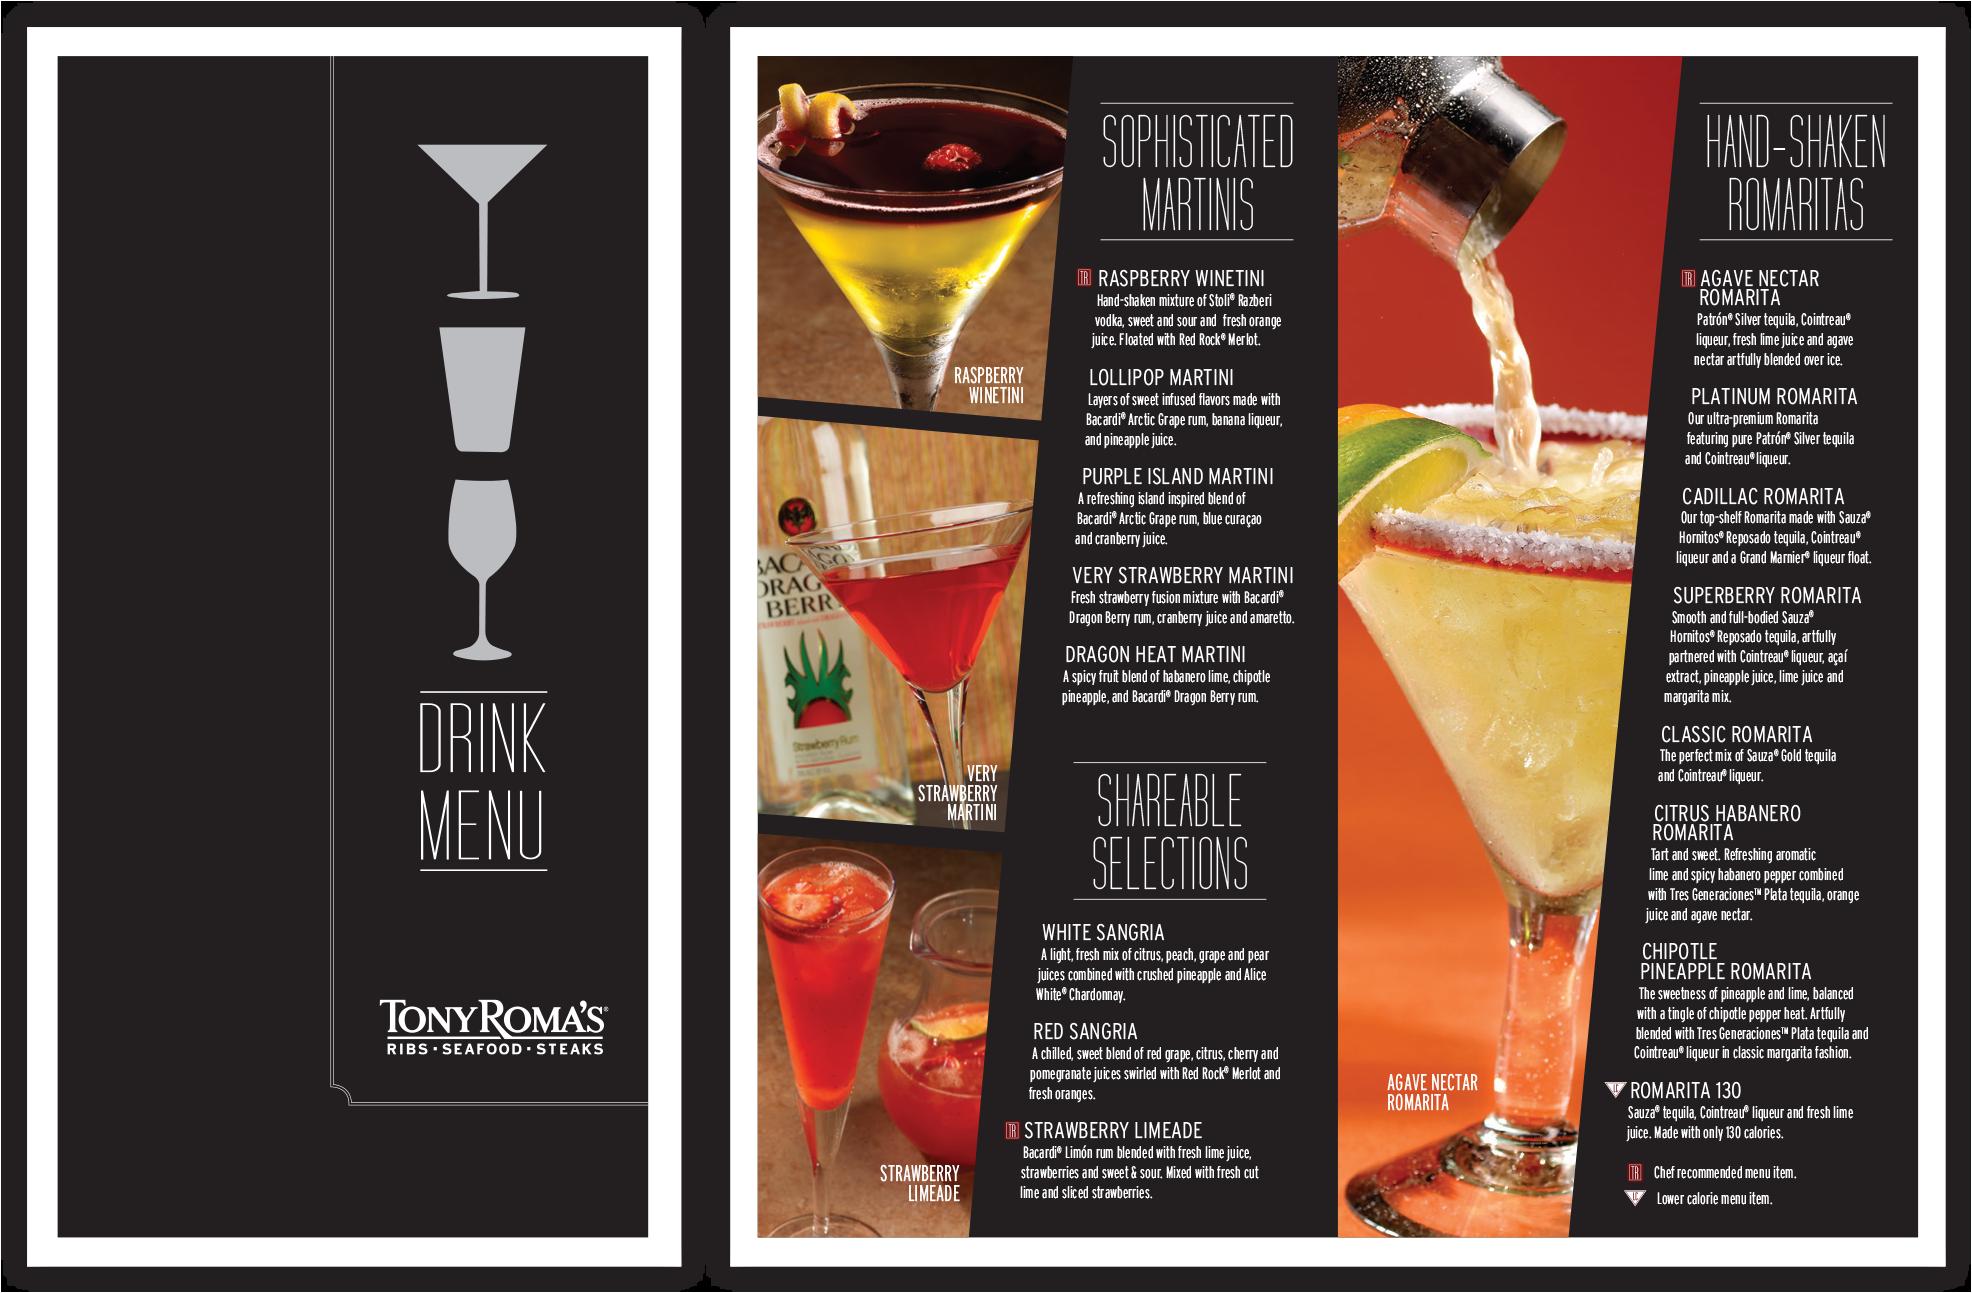 tr's drink menu 2012 | design | pinterest | menu design, drink menu